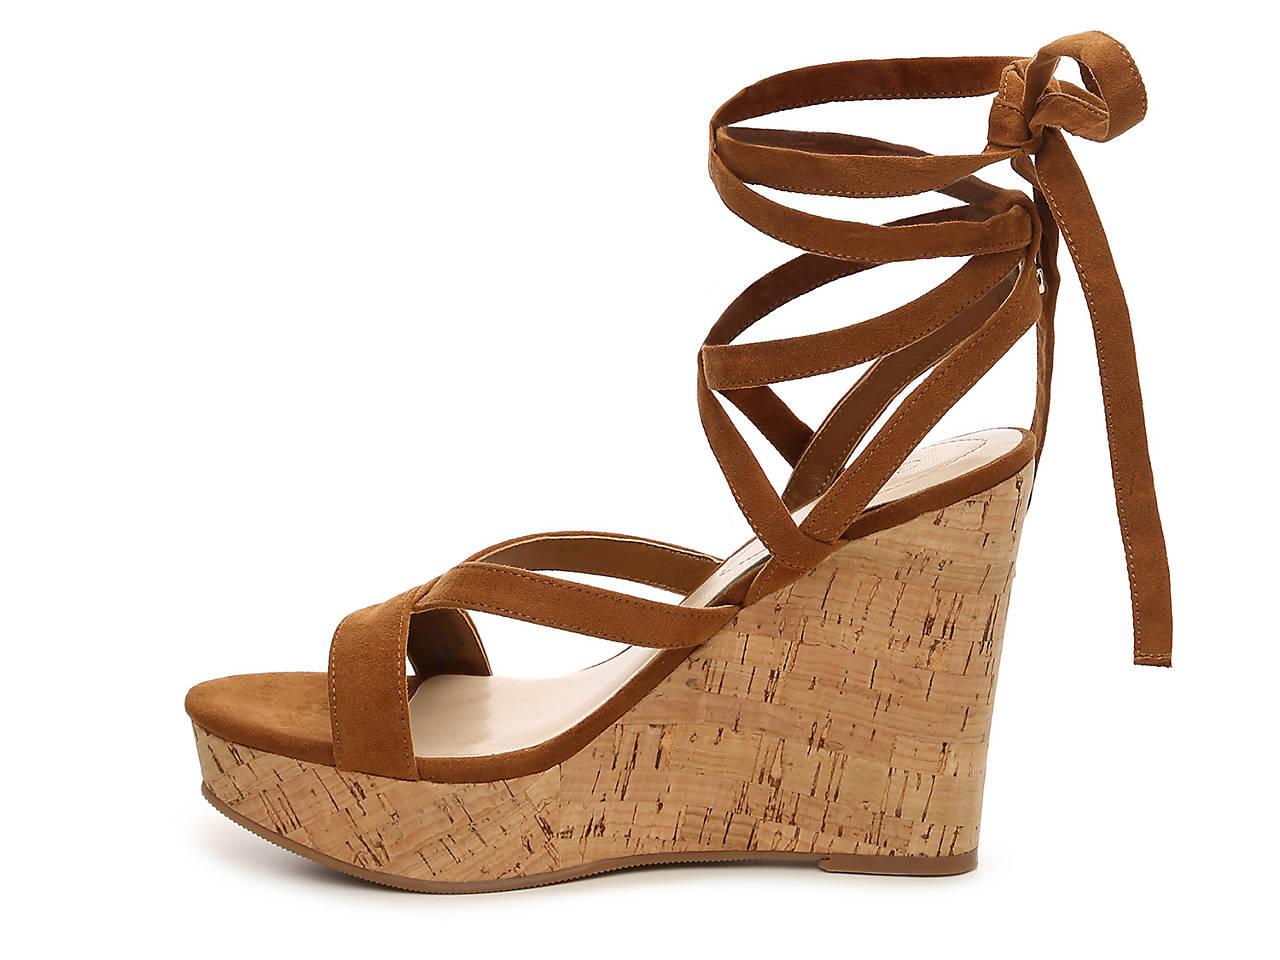 a440fd9a3c0a Guess Treacy Wedge Sandal Women s Shoes